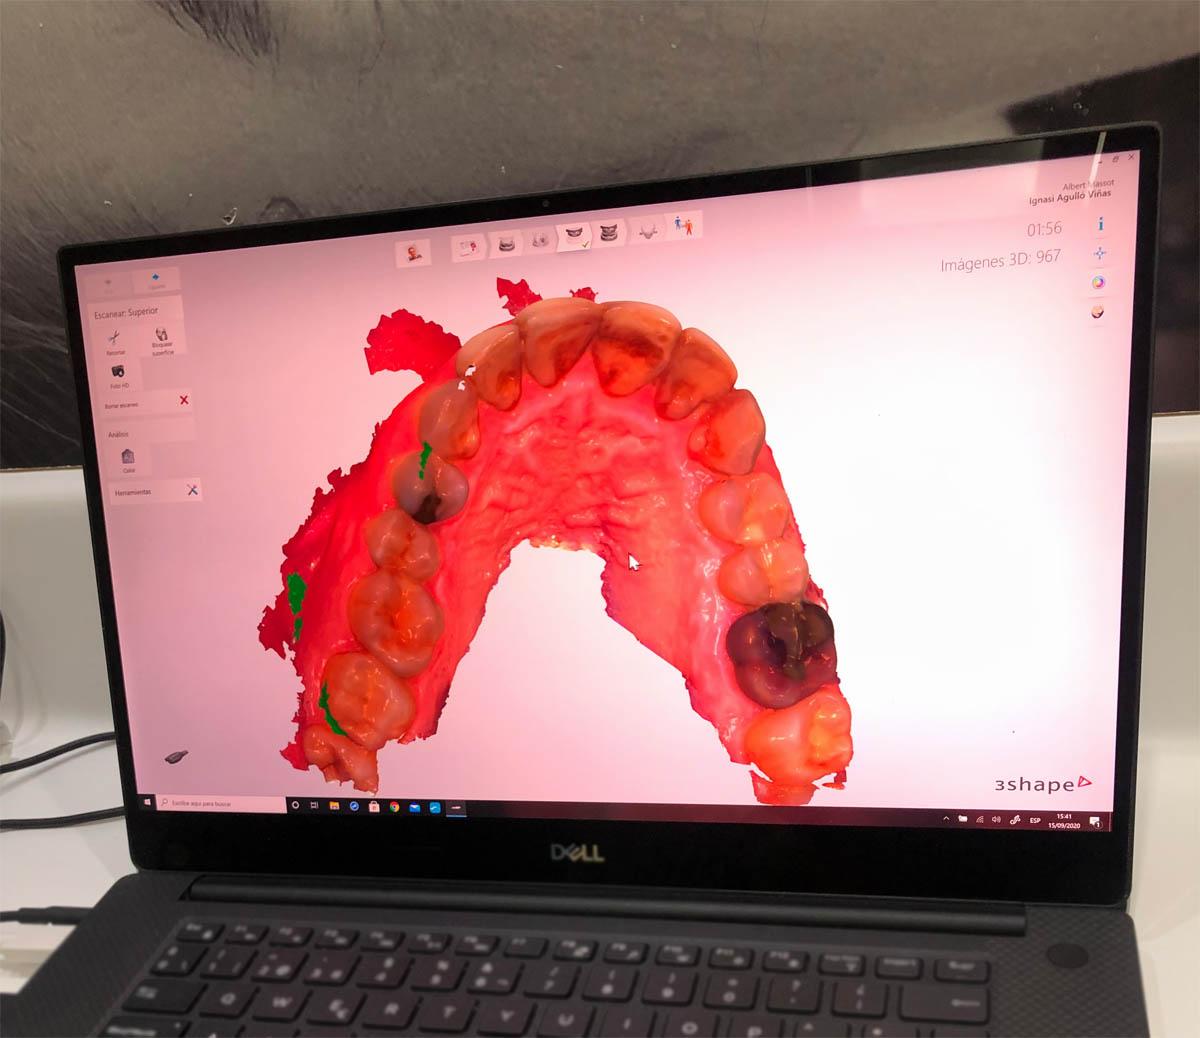 Carreras Dental - Escanejat bucal pròtesi dental